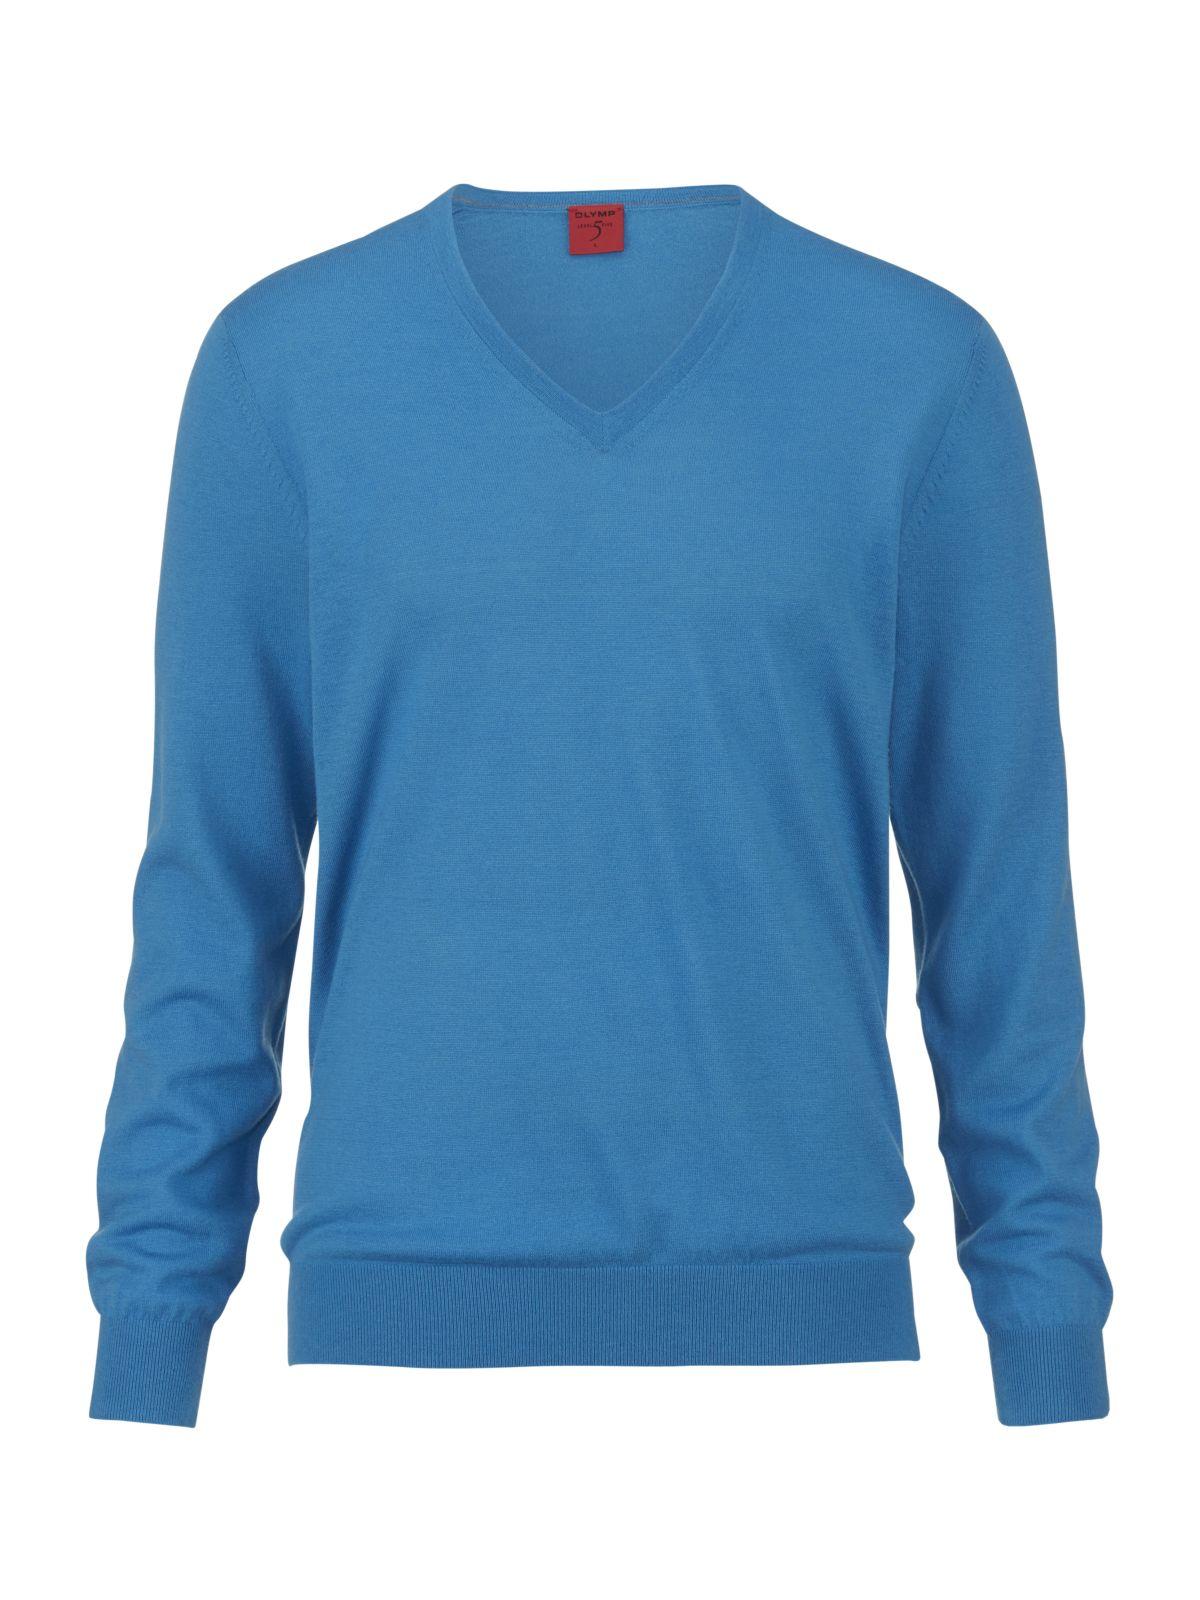 hemd so olymp level 5 v pullover extrafeine merinowolle seide himmelblau. Black Bedroom Furniture Sets. Home Design Ideas